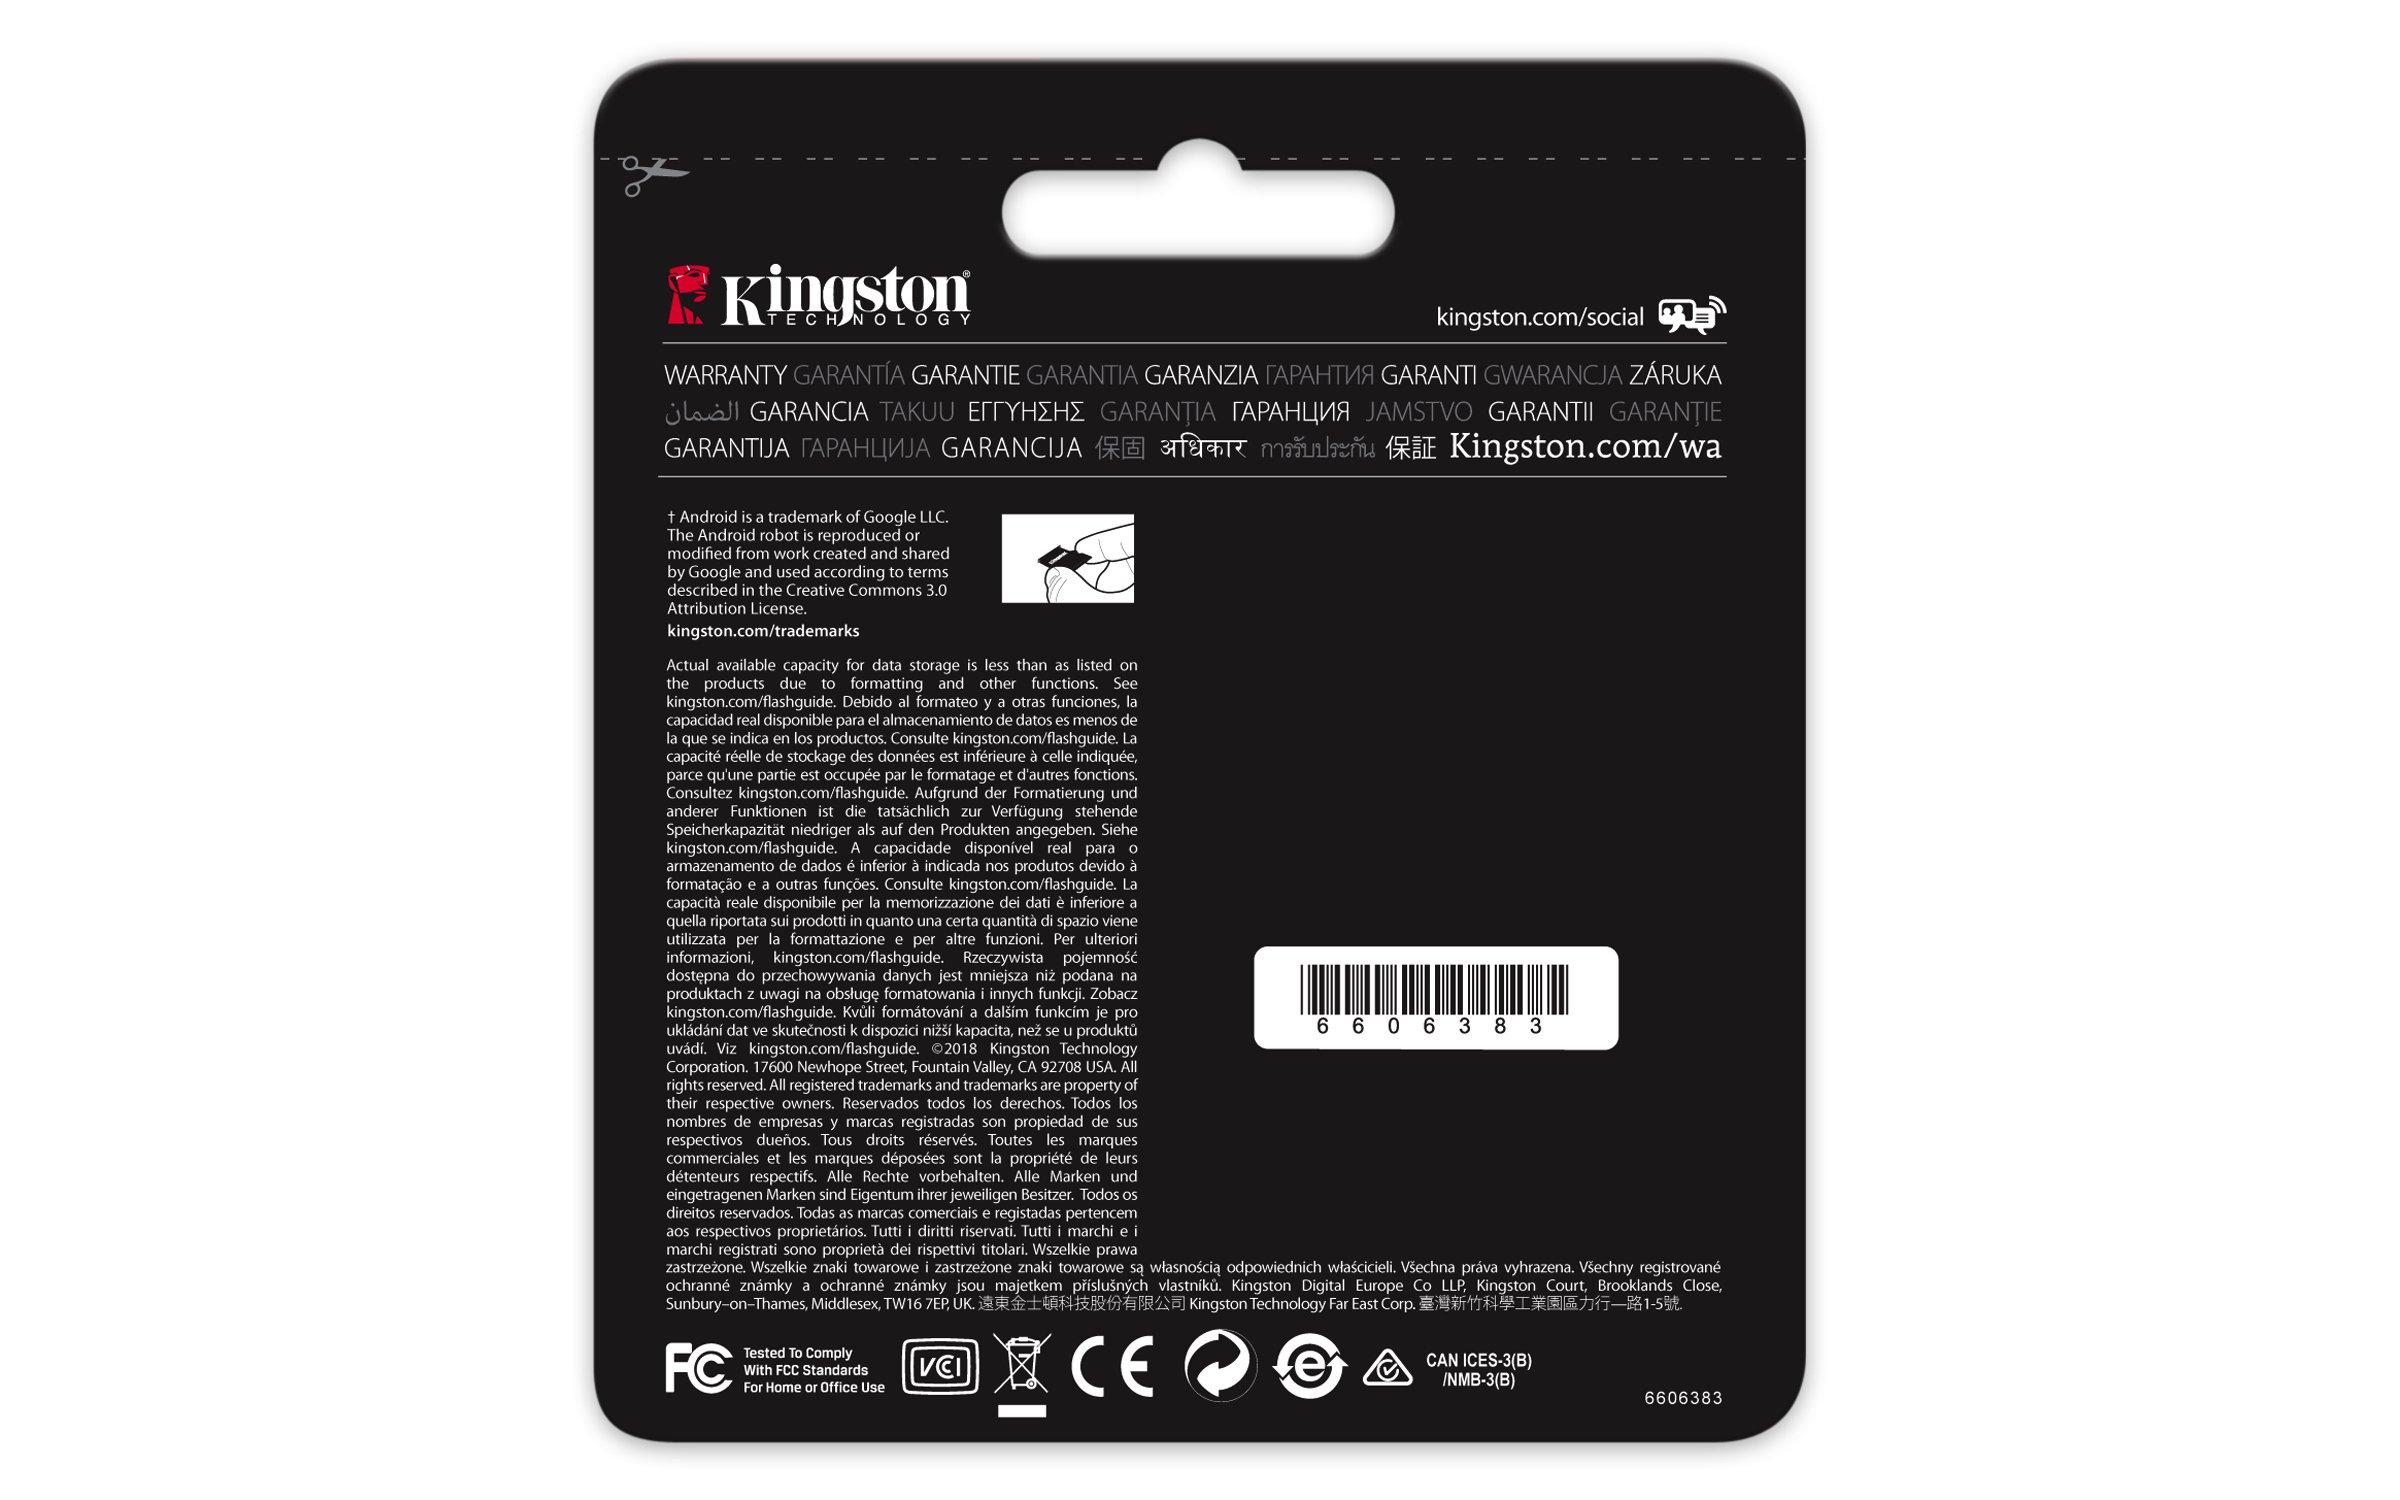 Kingston Digital SDCR/256GB Canvas React 256GB microSDXC Class 10 microSD Memory Card UHS-I 100MB/s R Flash Memory High Speed microSD Card with Adapter by Kingston (Image #4)